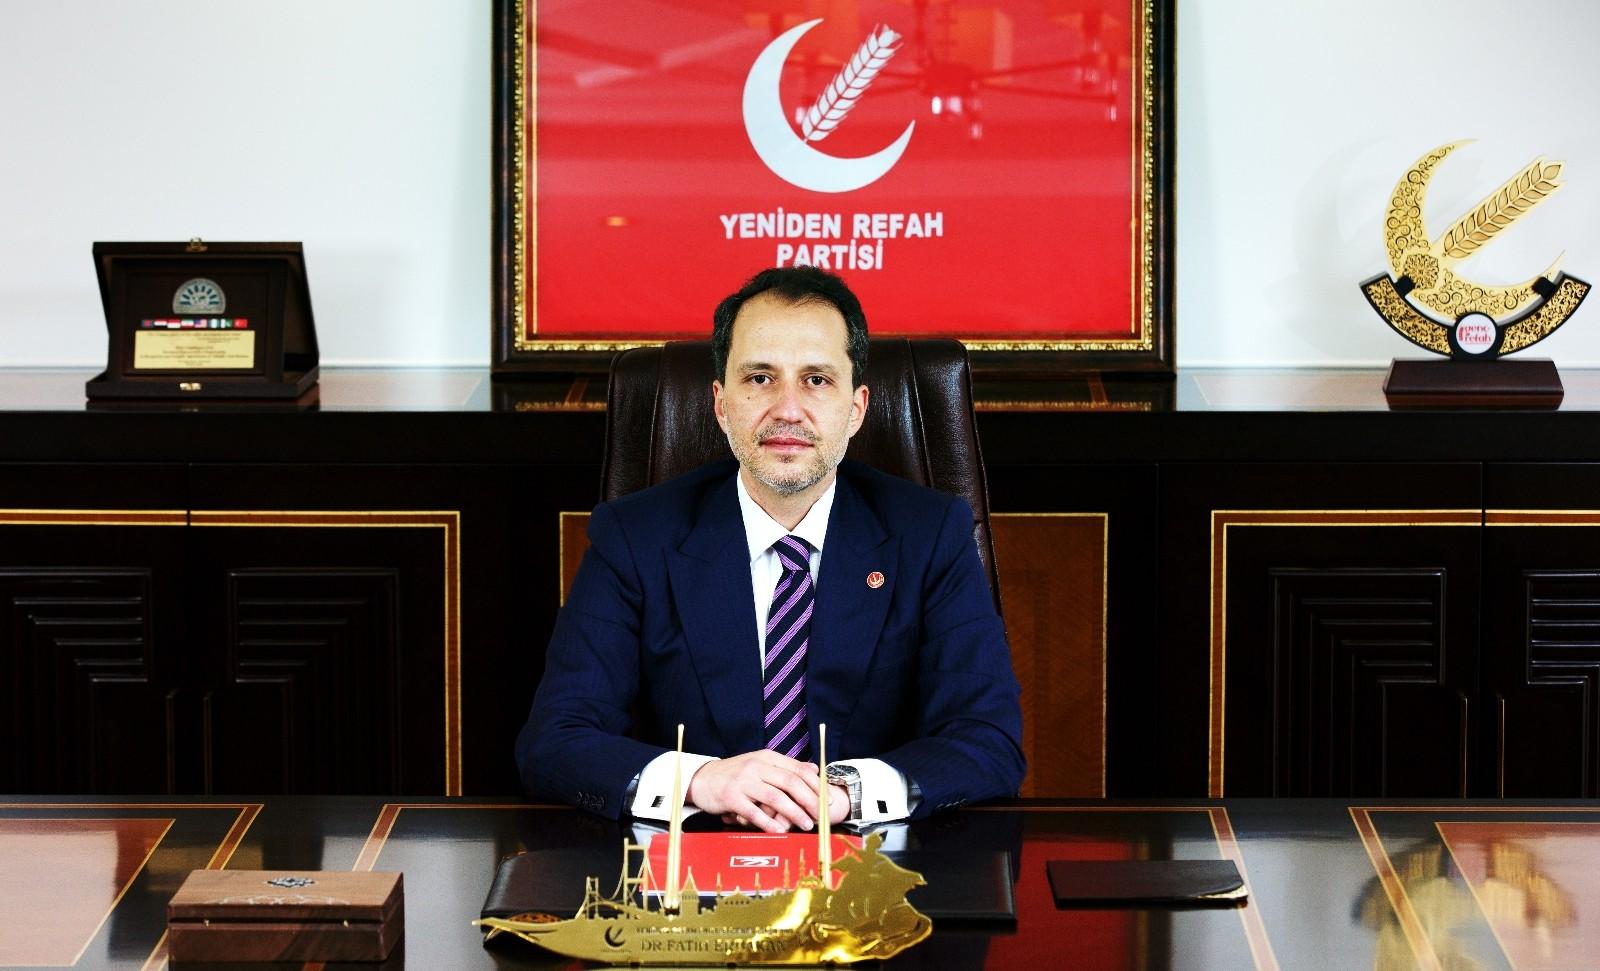 Yeniden Refah Partisi Lideri Erbakan: